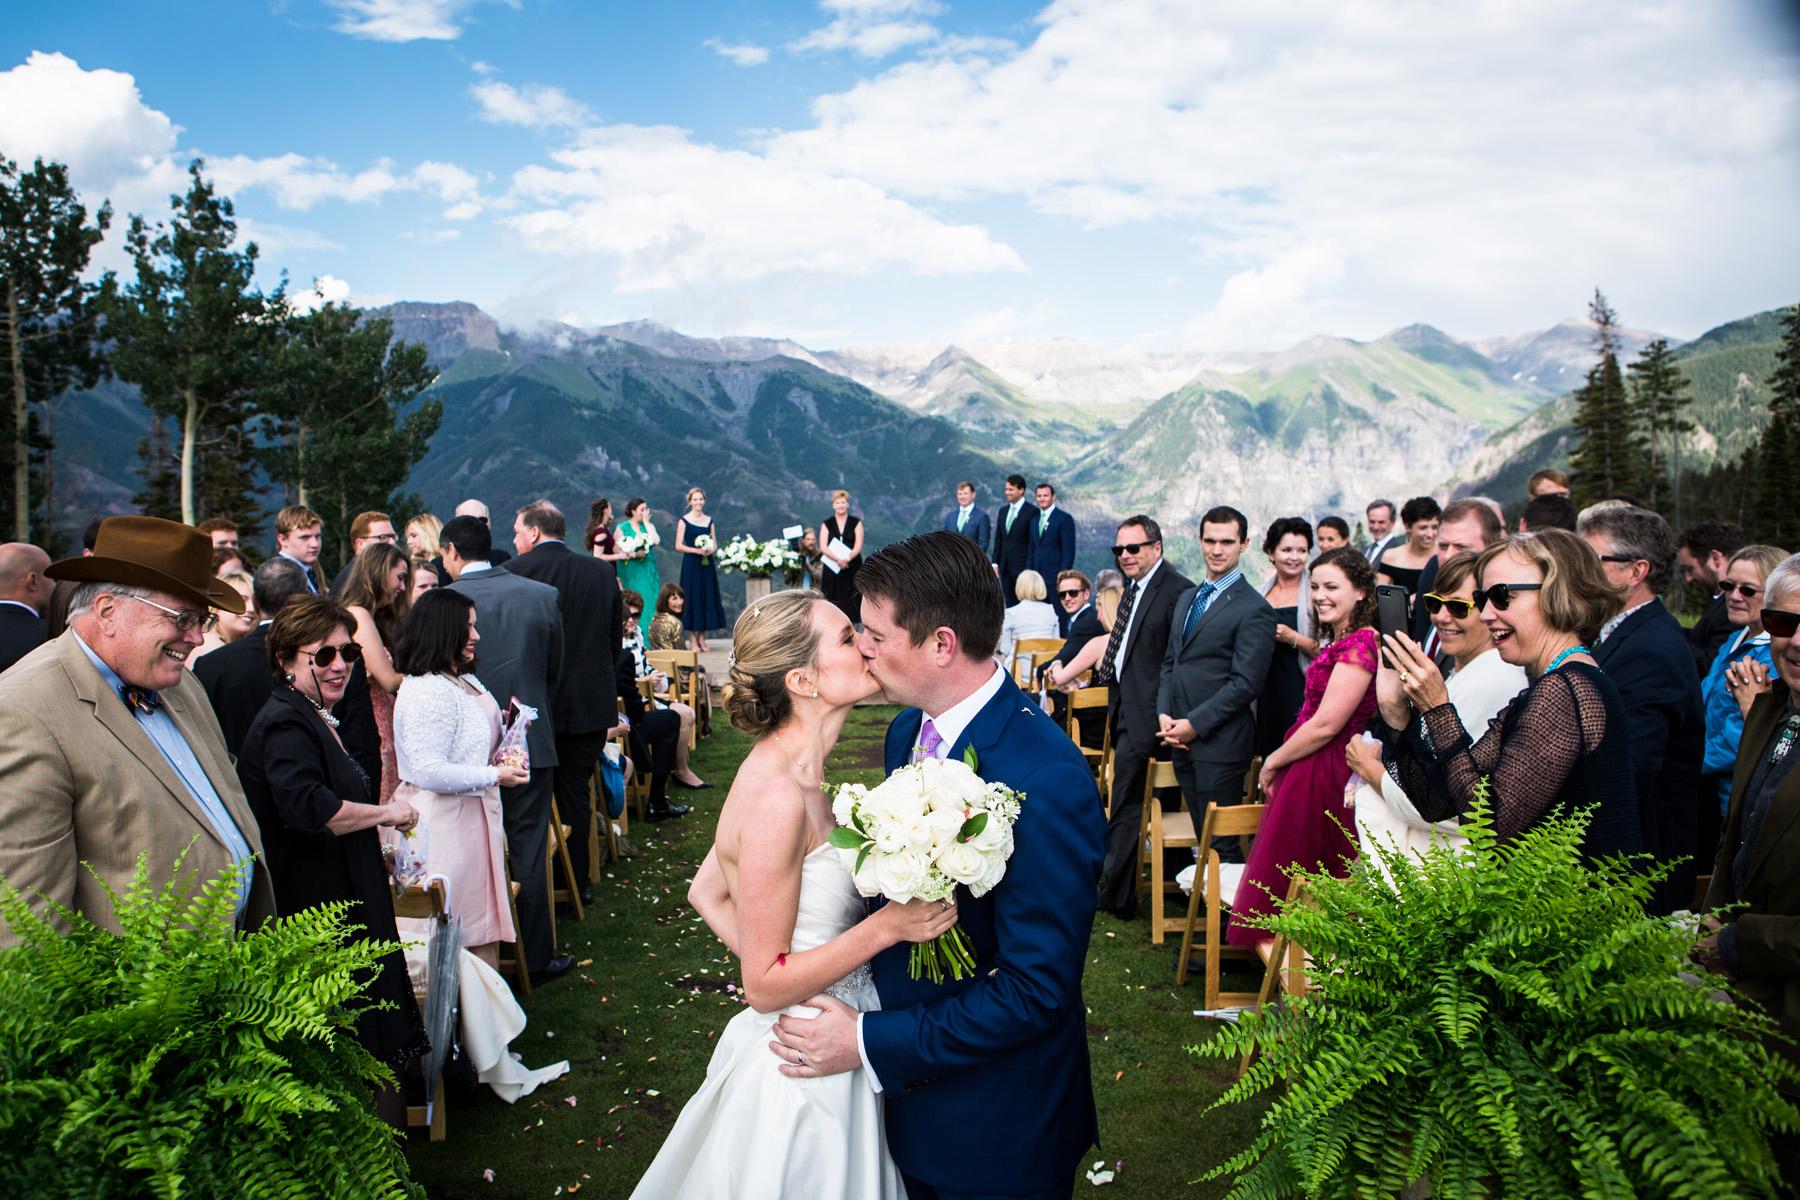 San Sophia Overlook, Telluride Colorado photographed by Telluride wedding photographer Real Life Photographs